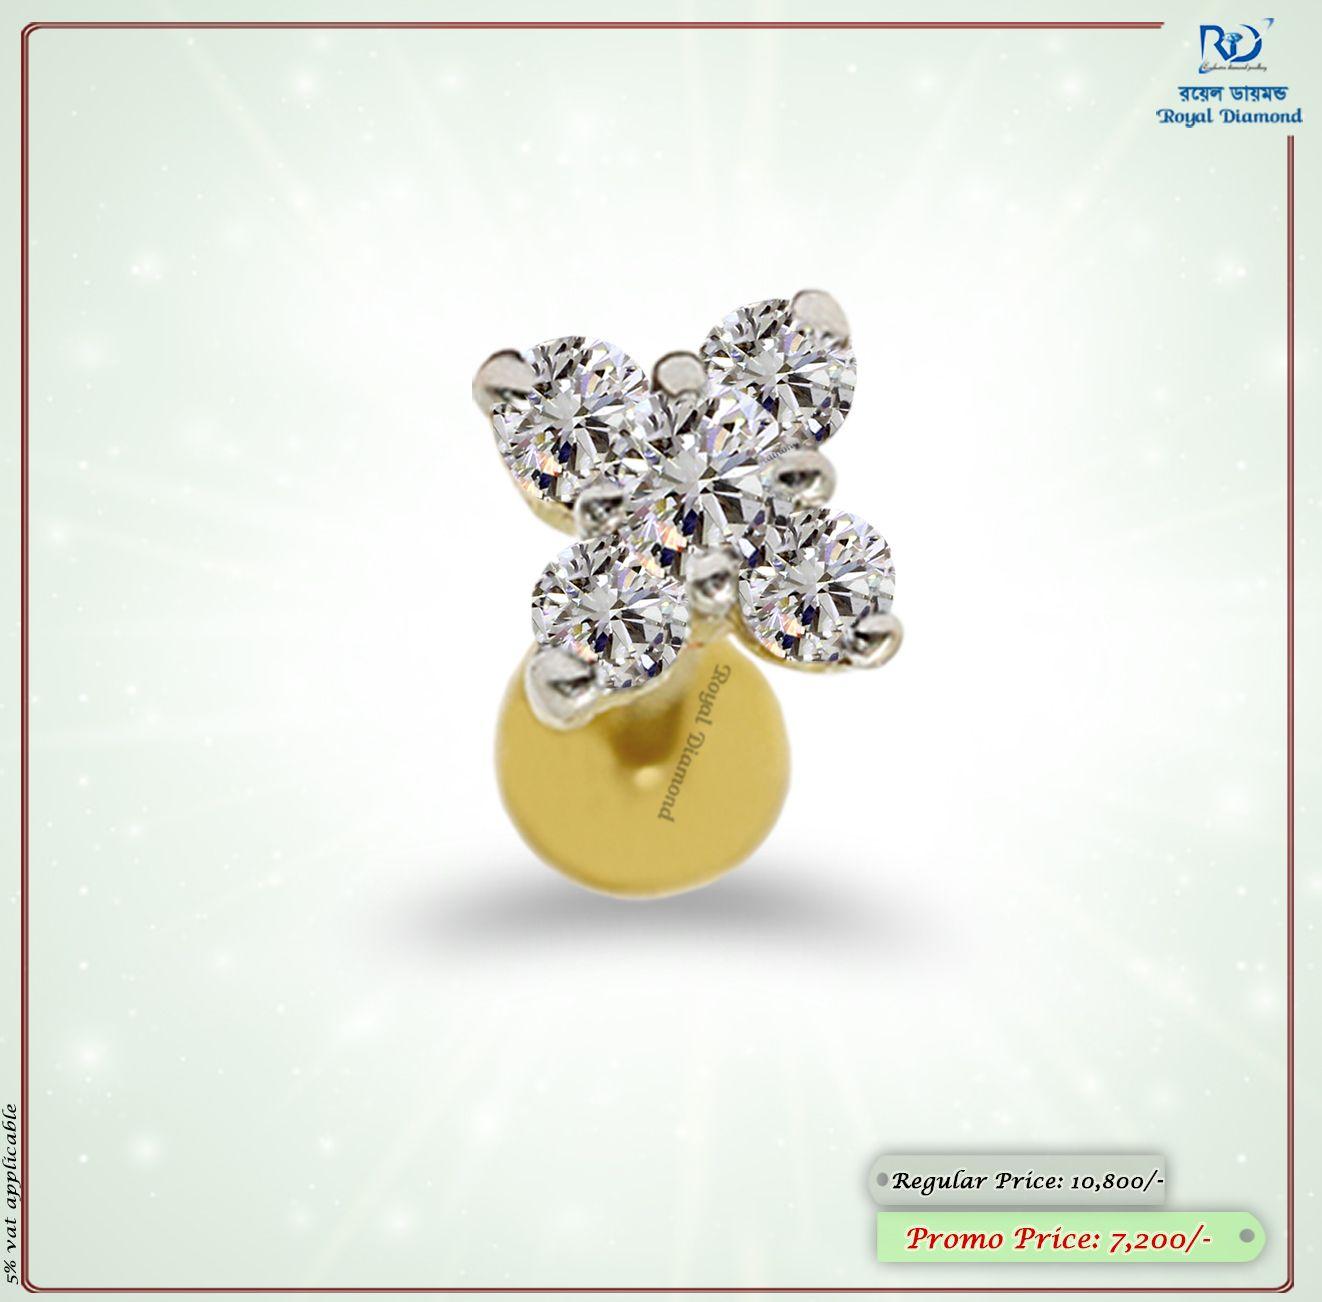 Royal diamond royaldiamondbd en pinterest